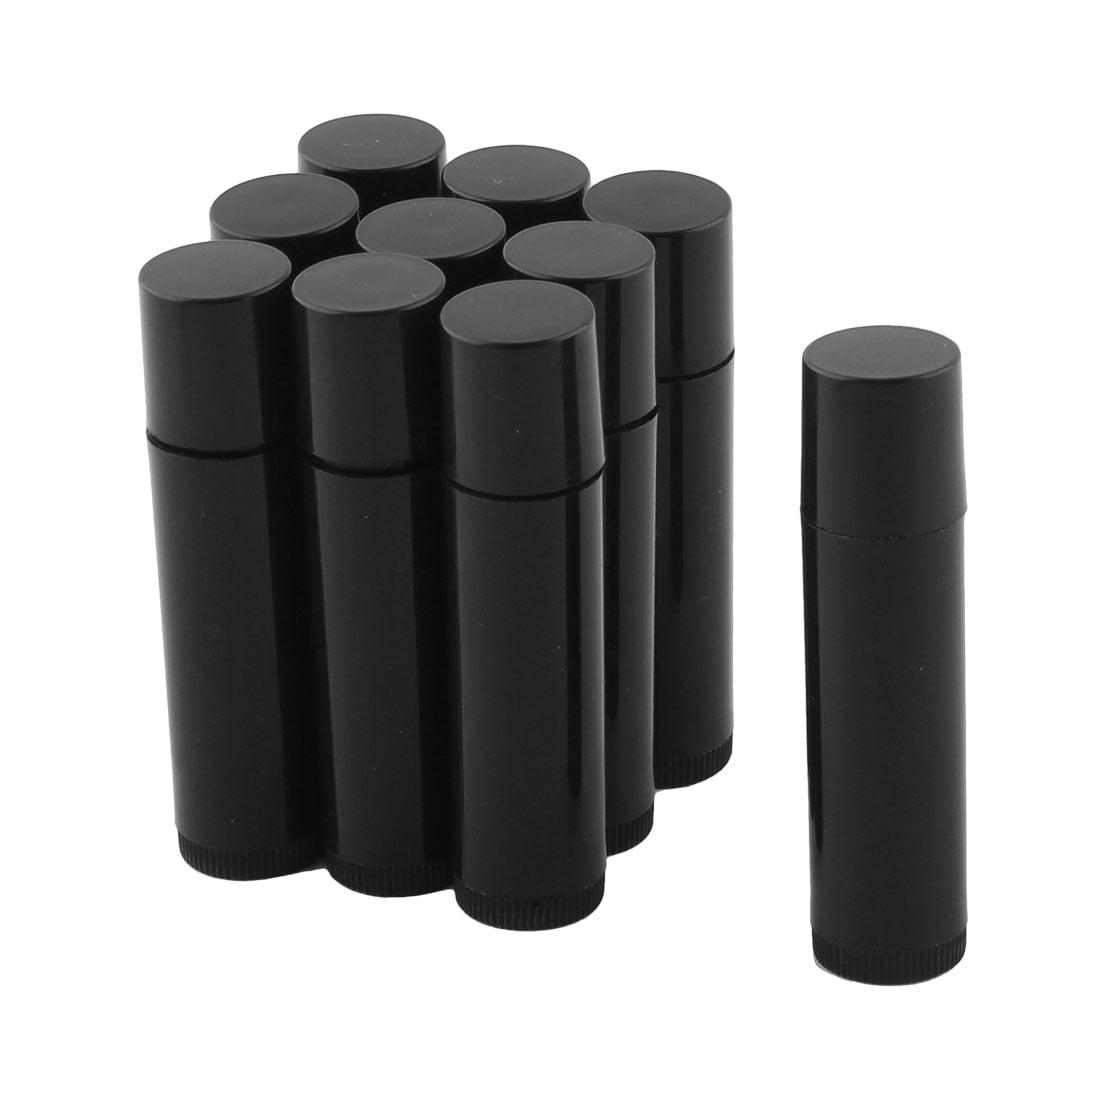 Lady Plastic Empty Lip Balm Tube Lipstick Chapstick Container Black 10 Pcs